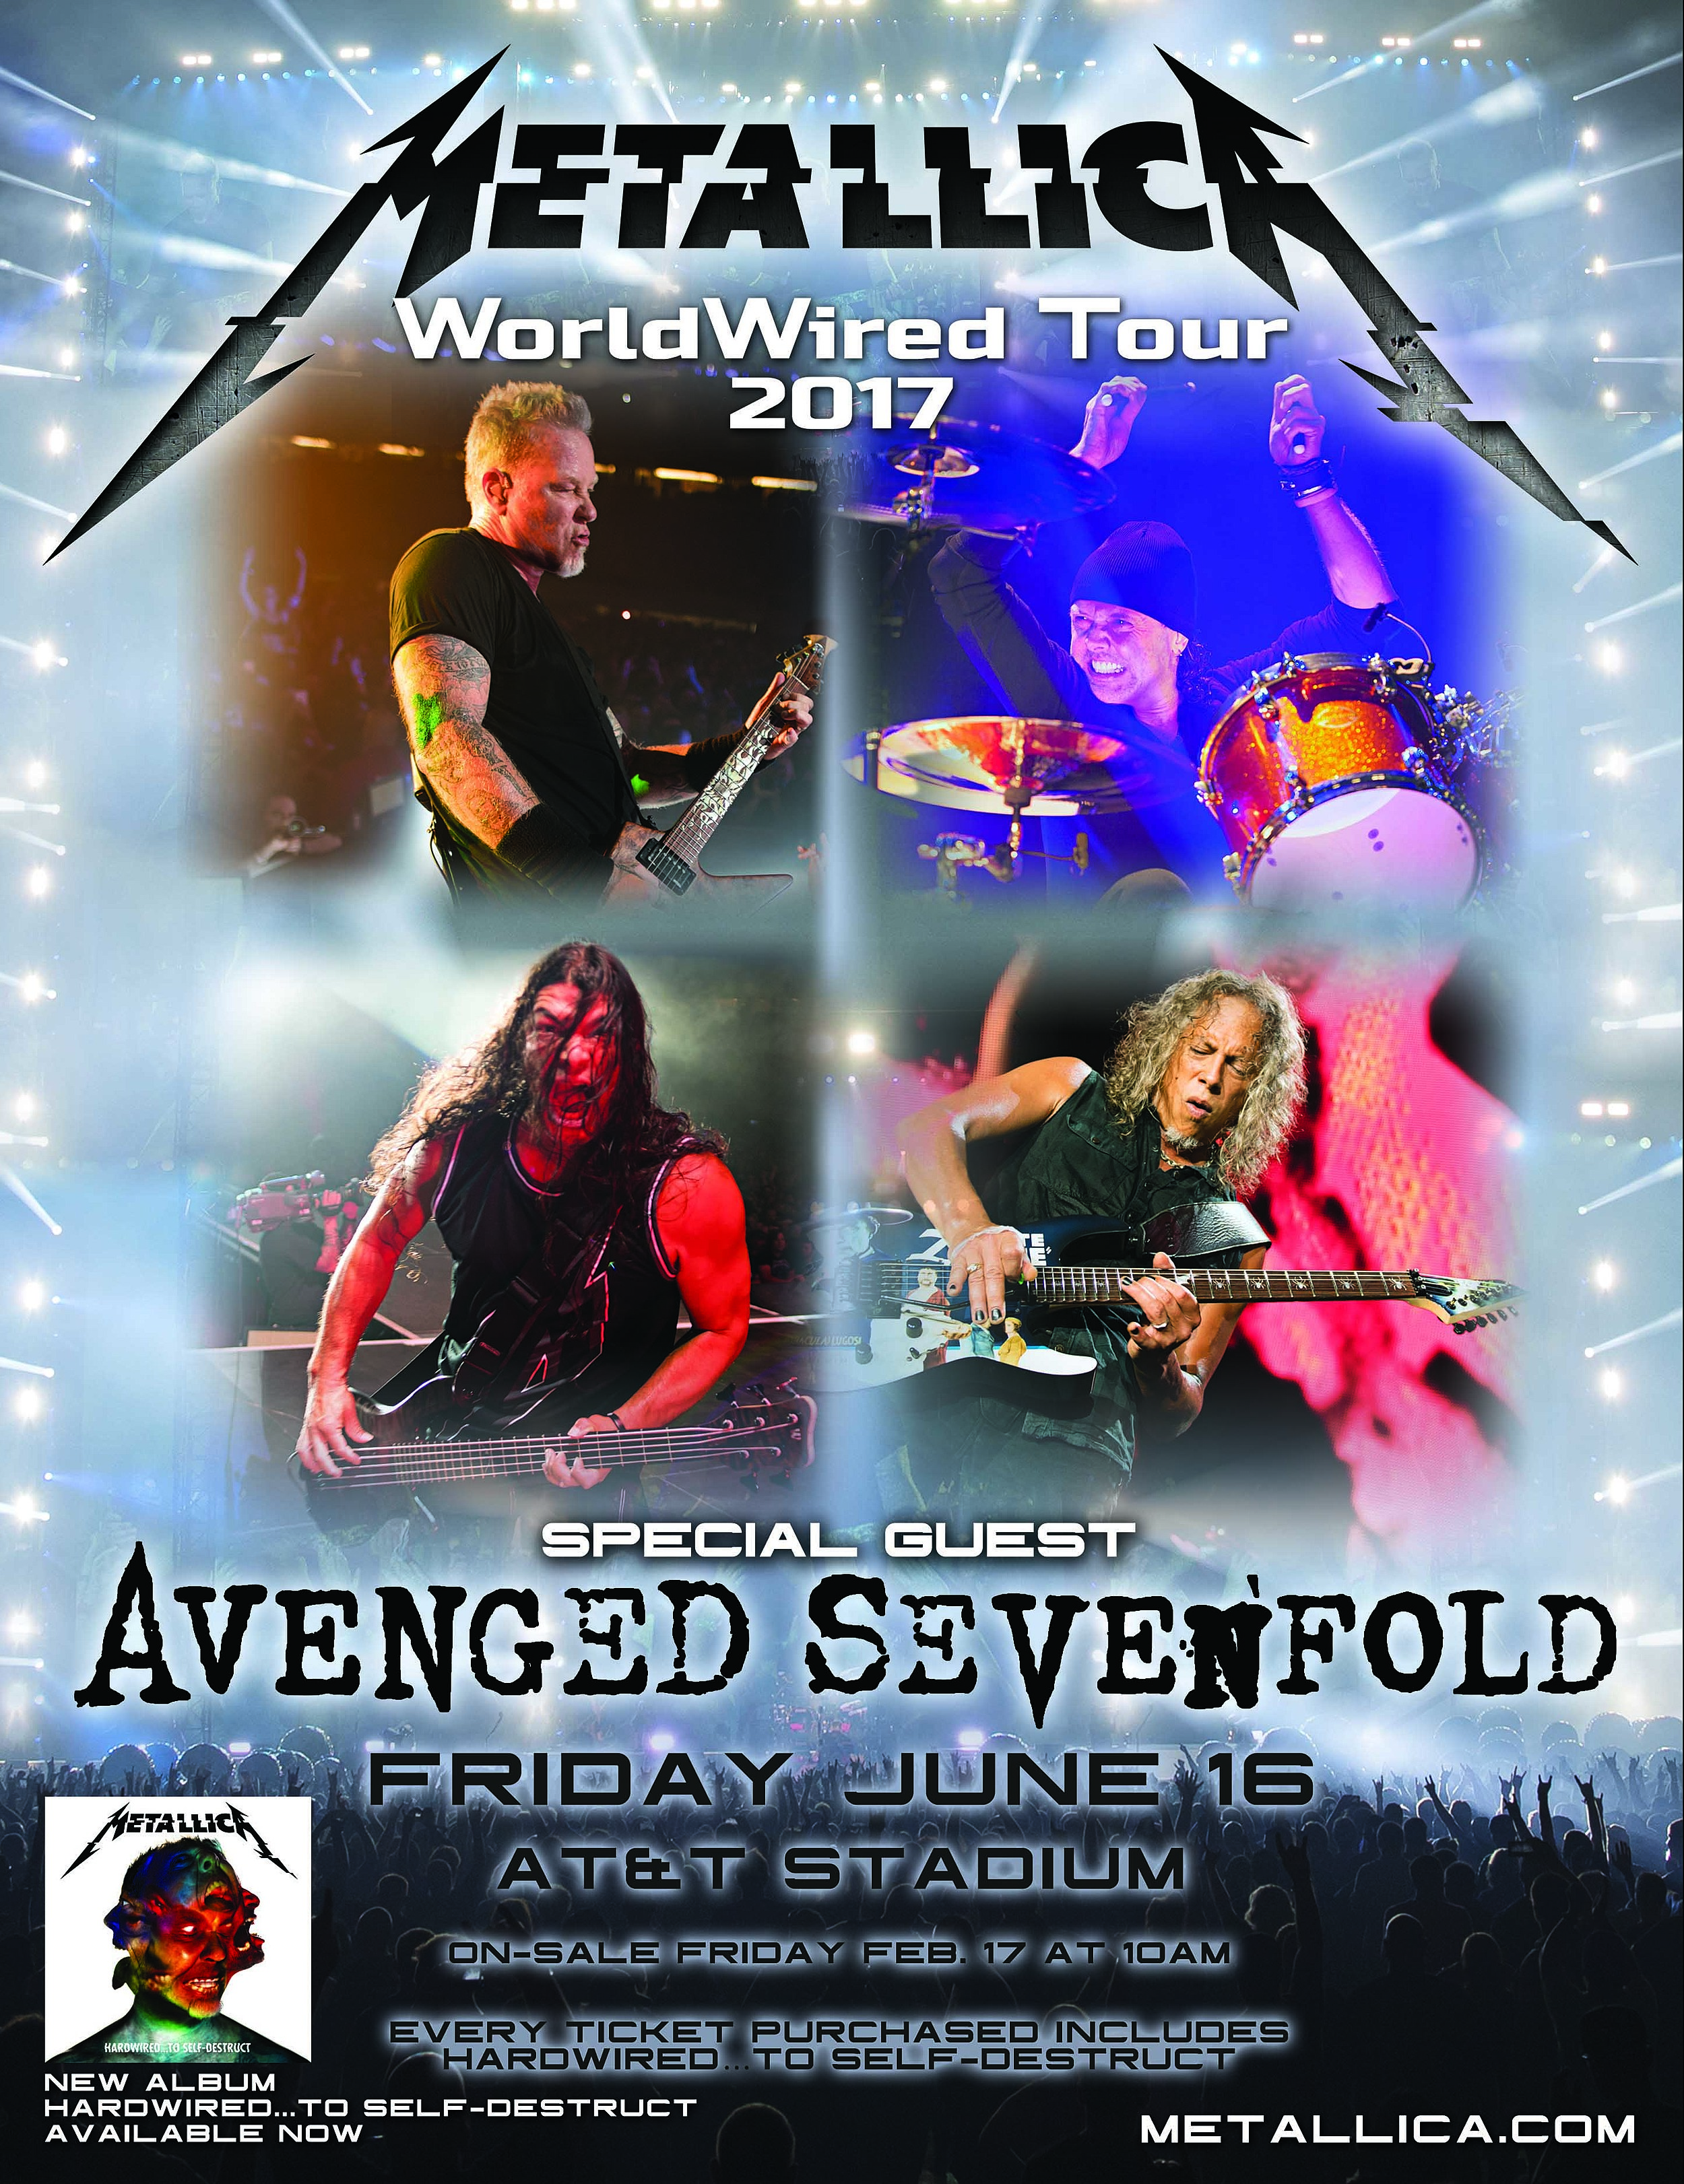 Metallica WorldWired Tour Poster